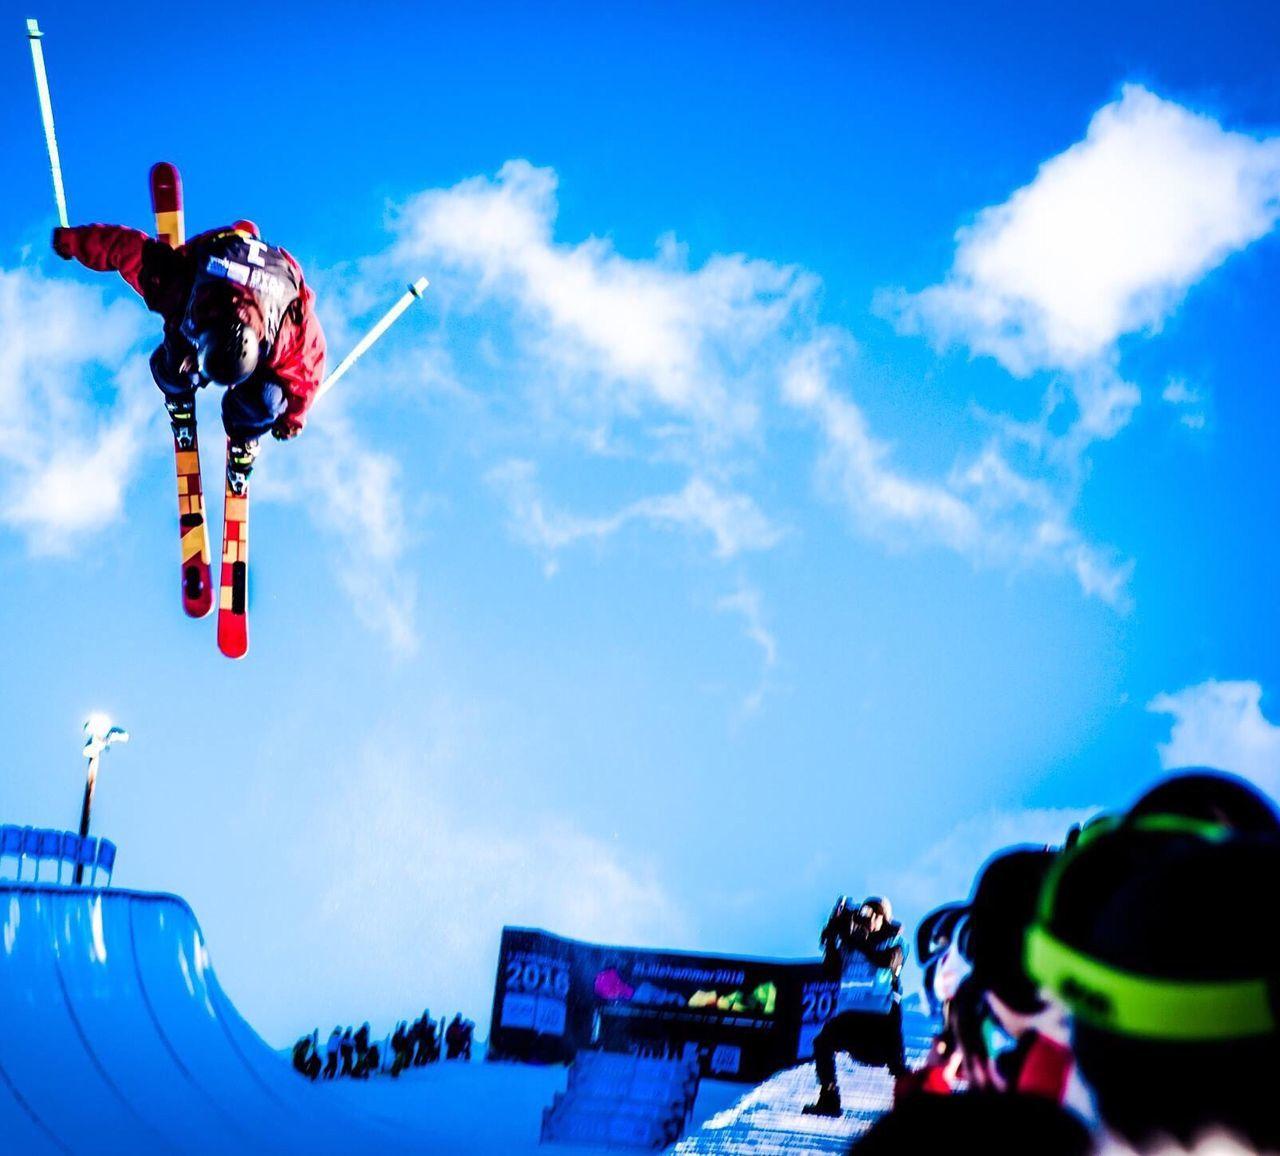 Showcase: February Yogdna Lillehammer2016 Oslo Norway Superpipe Freeskiing